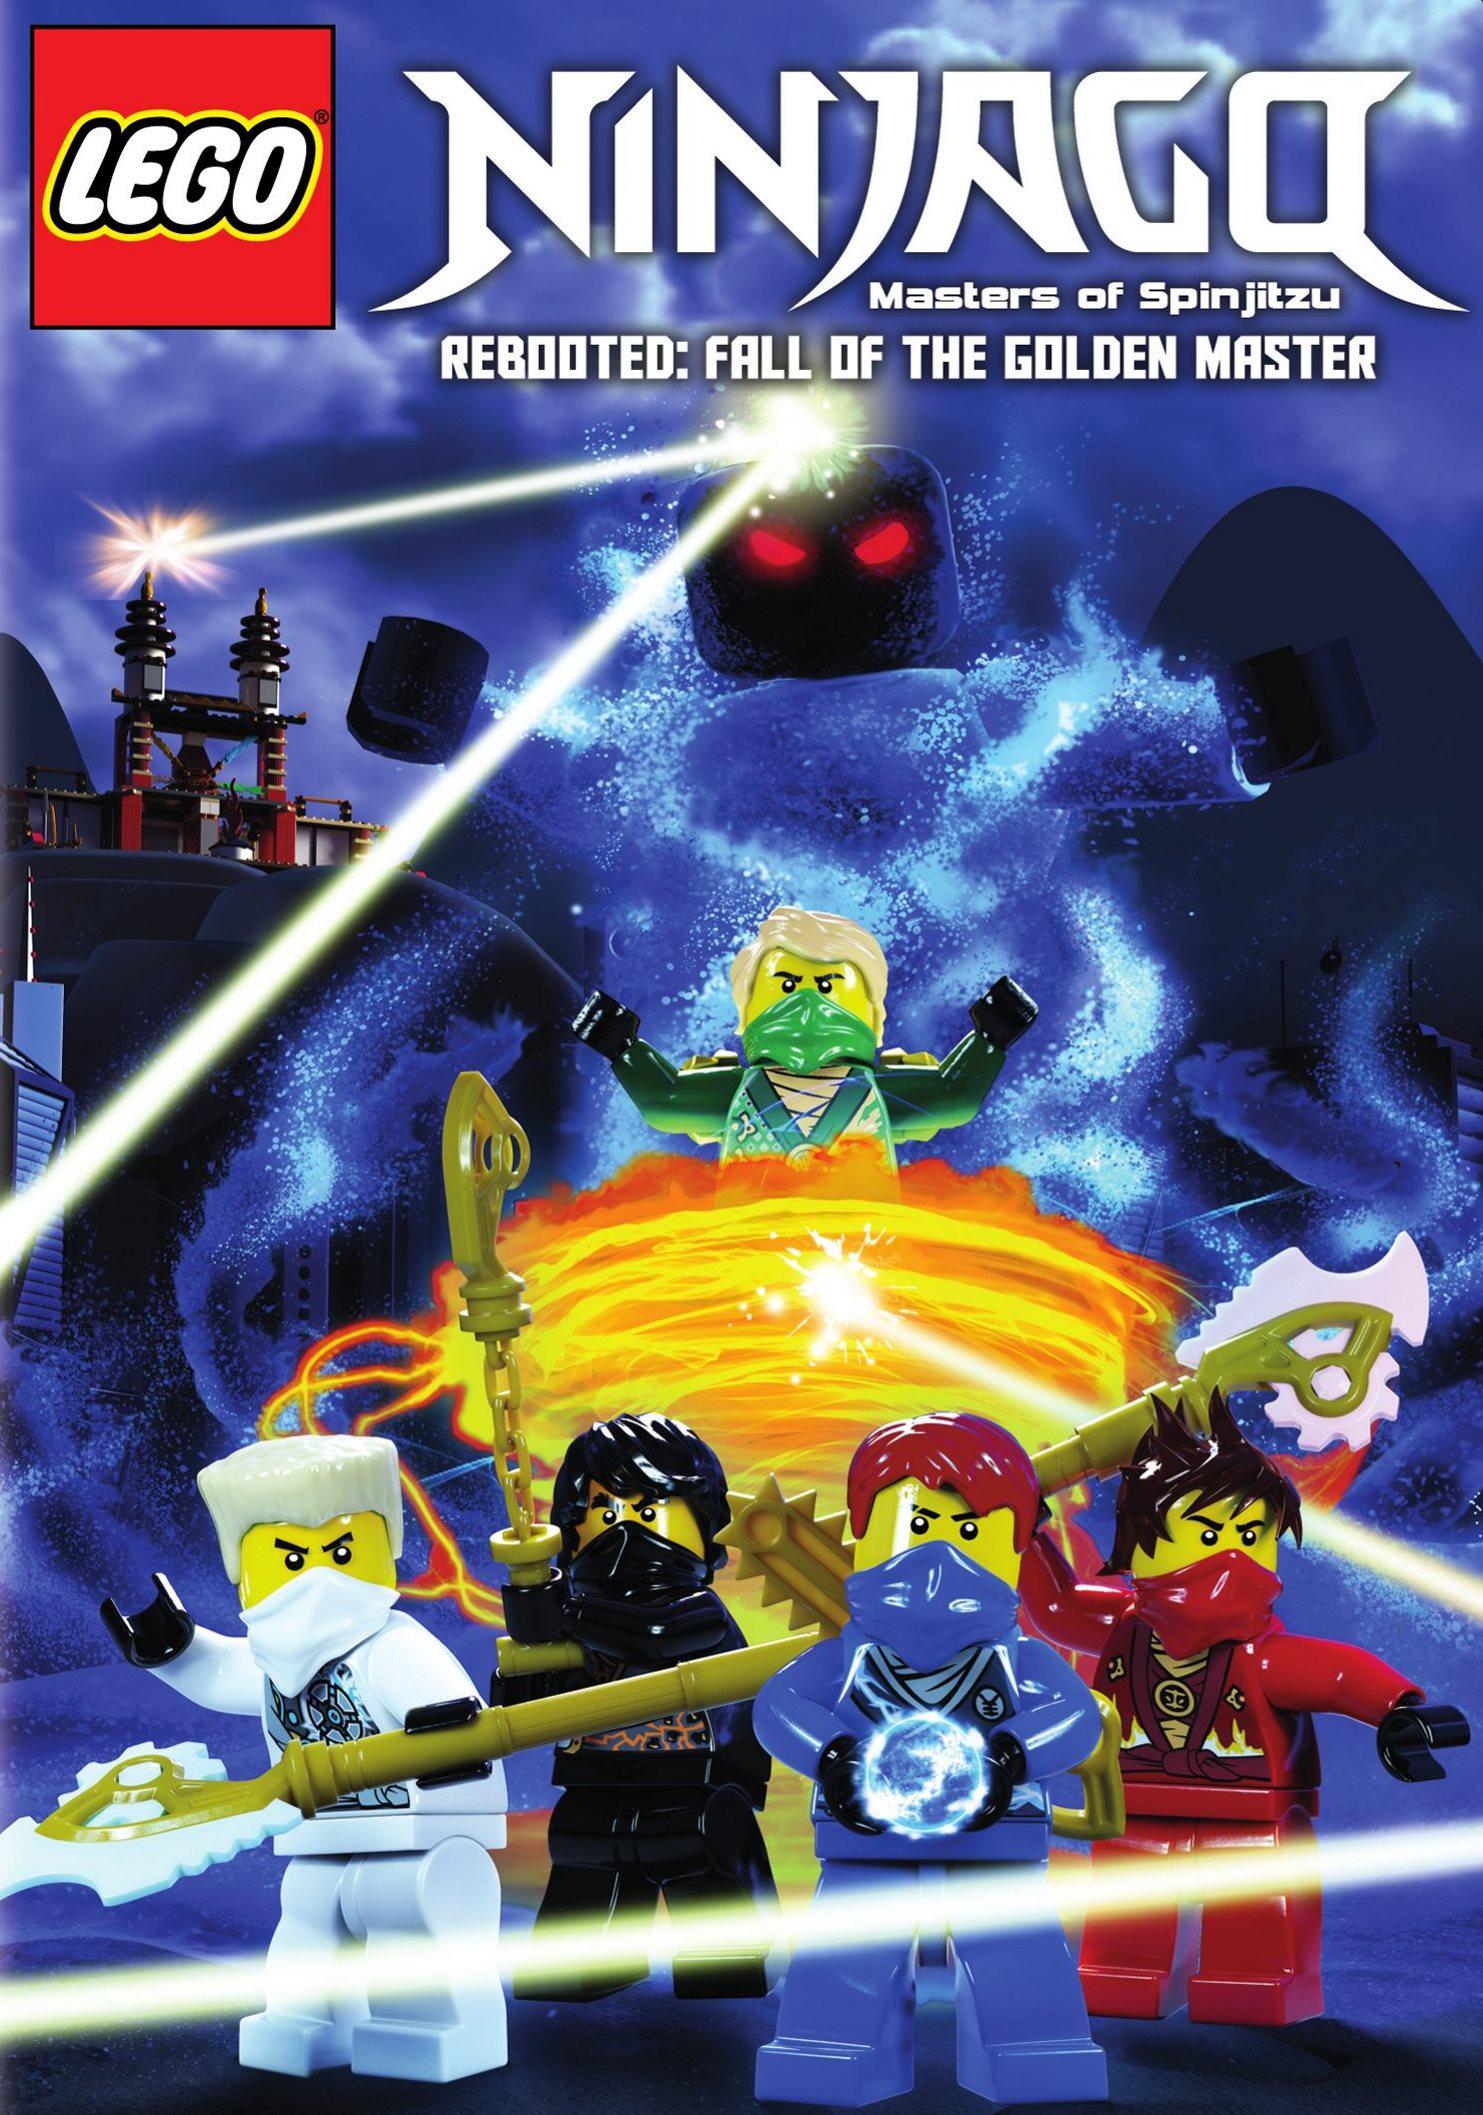 Lego Ninjago: Masters Of Spinjitzu - Rebooted: Fall Of The Golden Master (dvd) 3076039